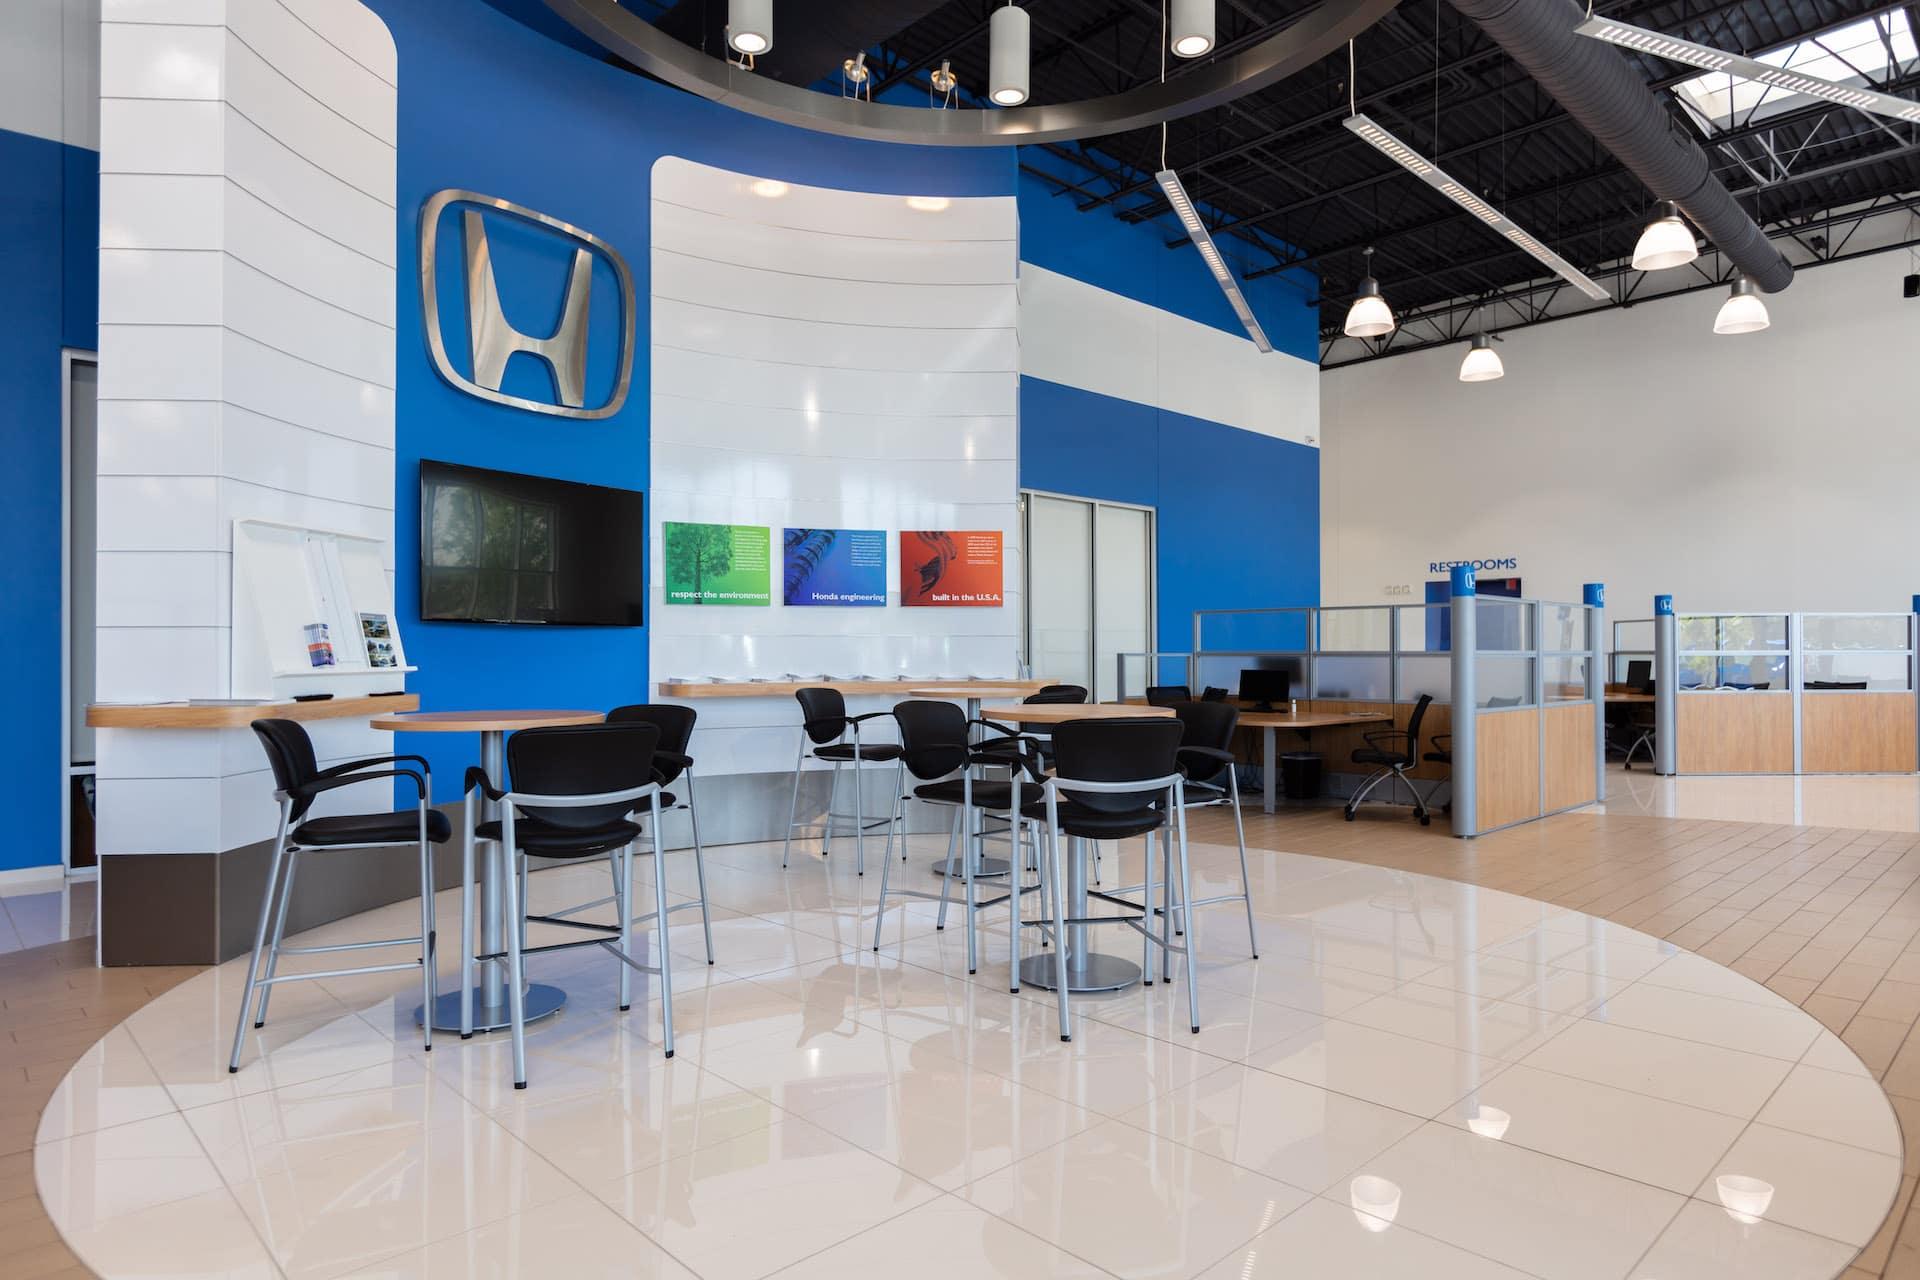 customer sitting area inside showroom at Mckenney-Salinas Honda